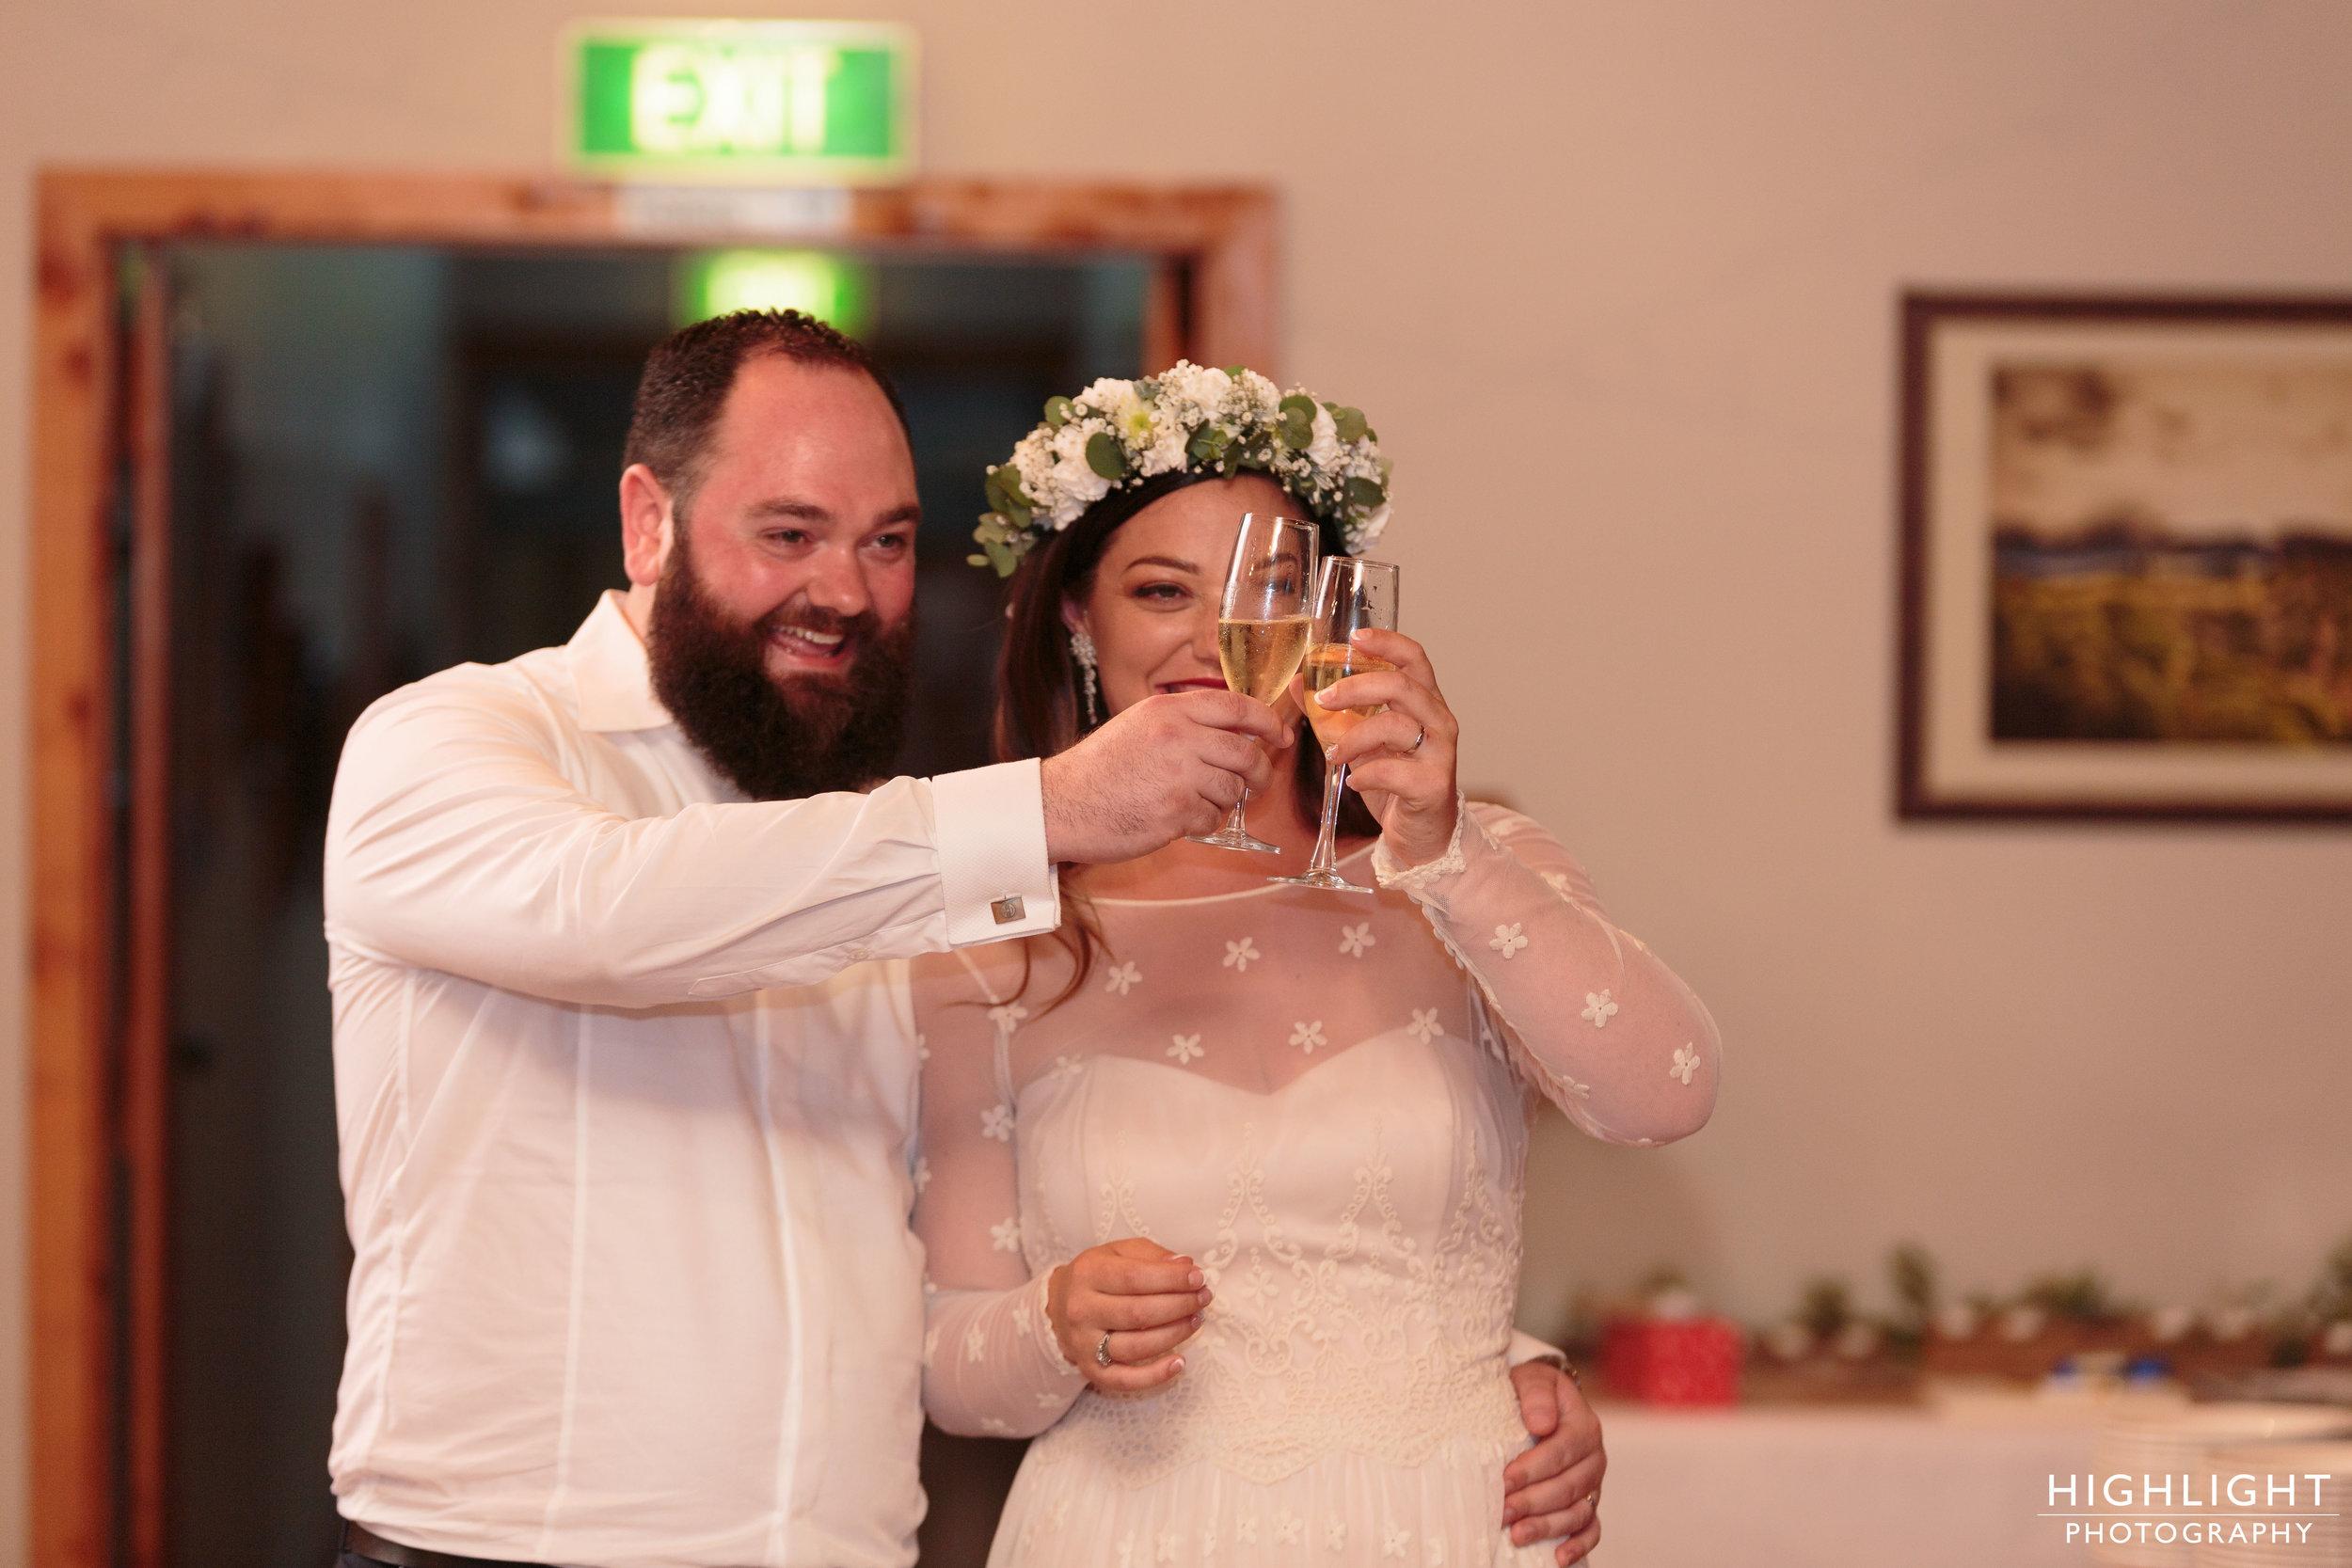 highlight-wedding-photography-new-zealand-makoura-lodge-wedding-169.jpg